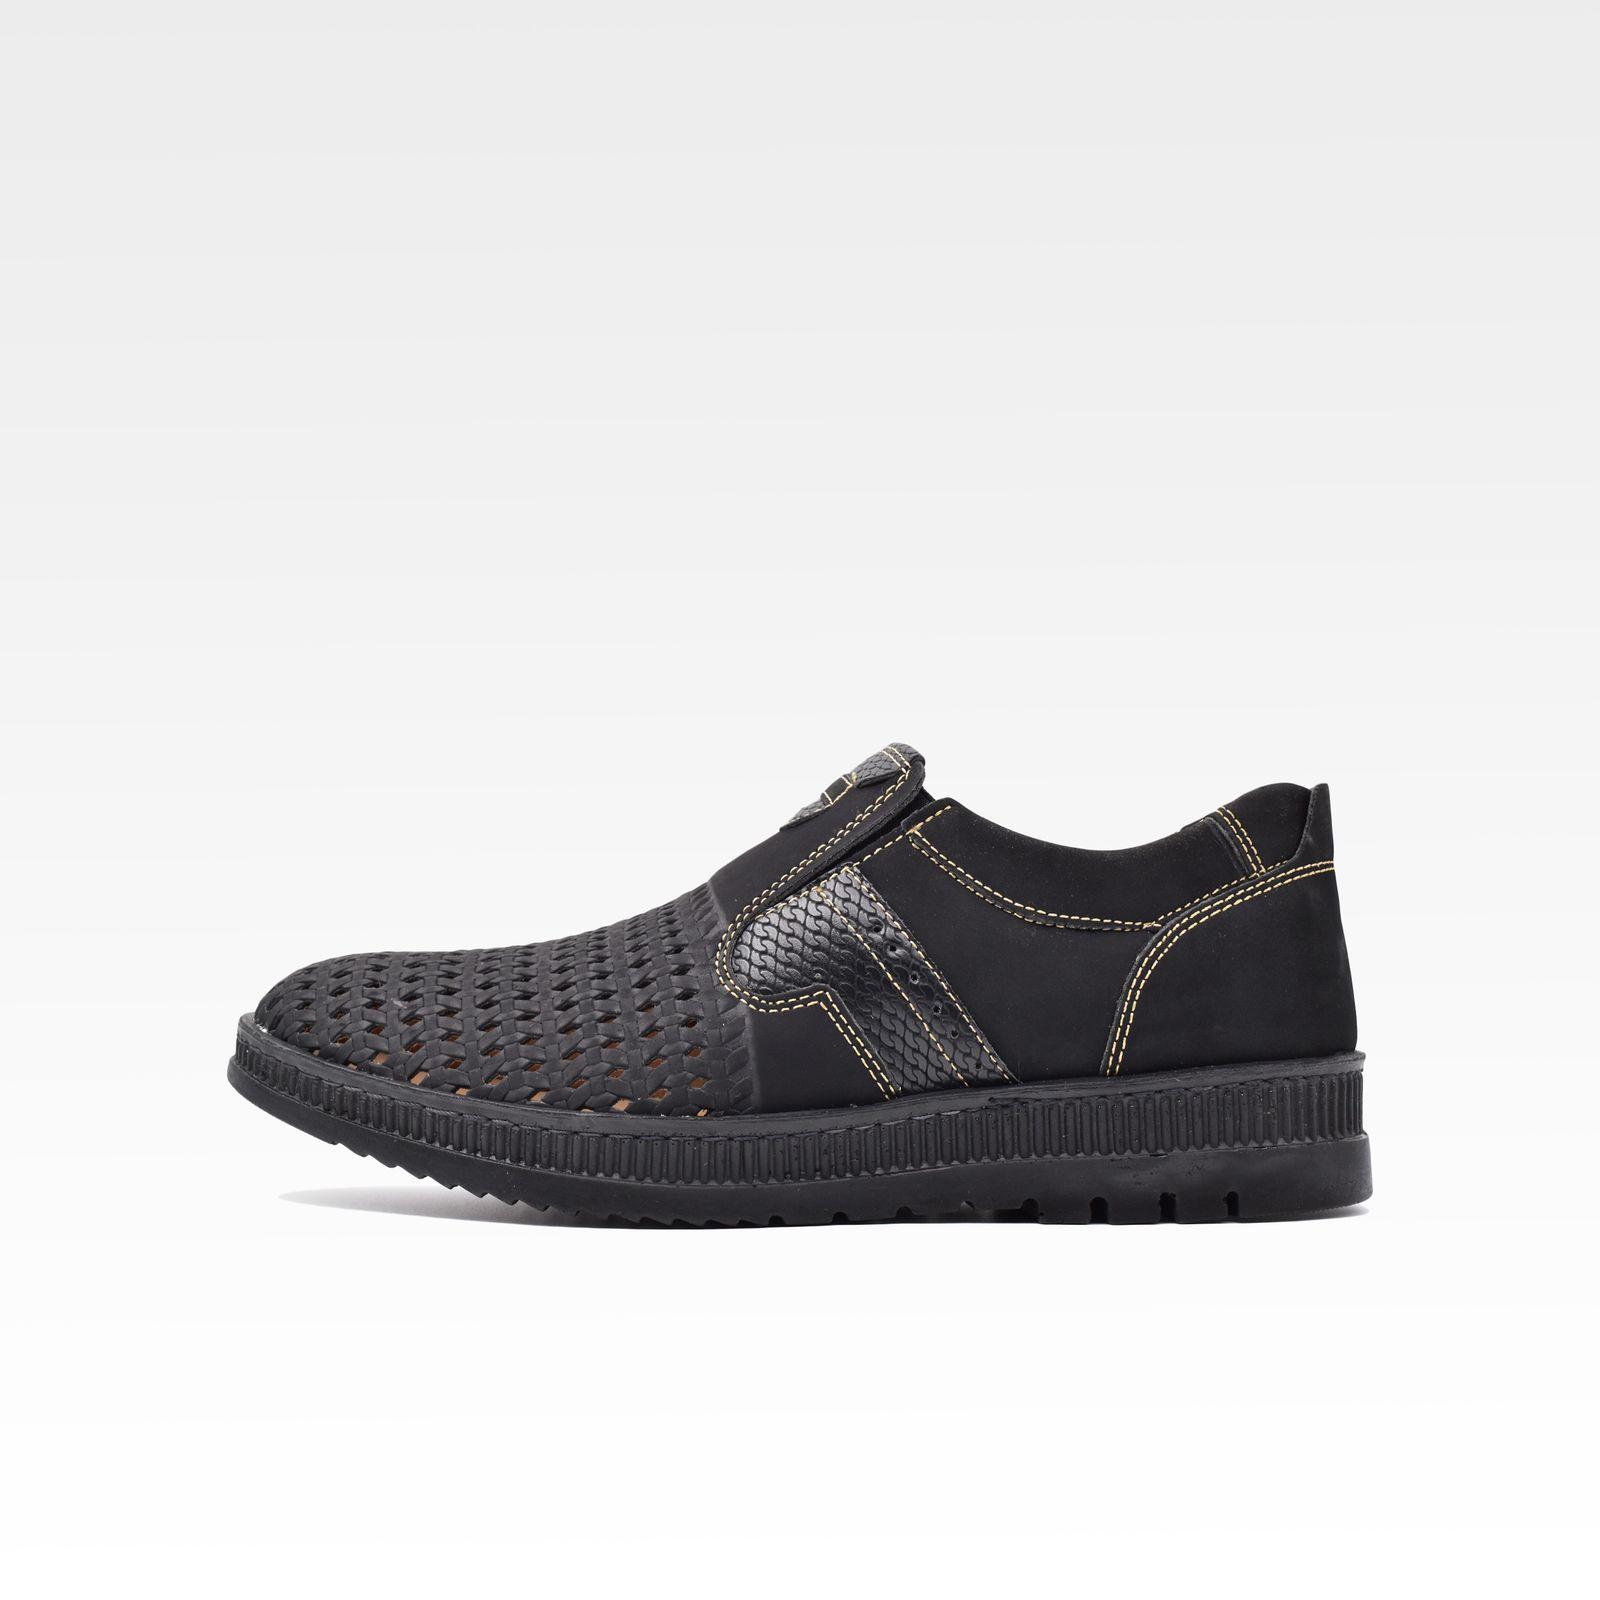 کفش روزمره مردانه مدل گلف کد 7014 -  - 1